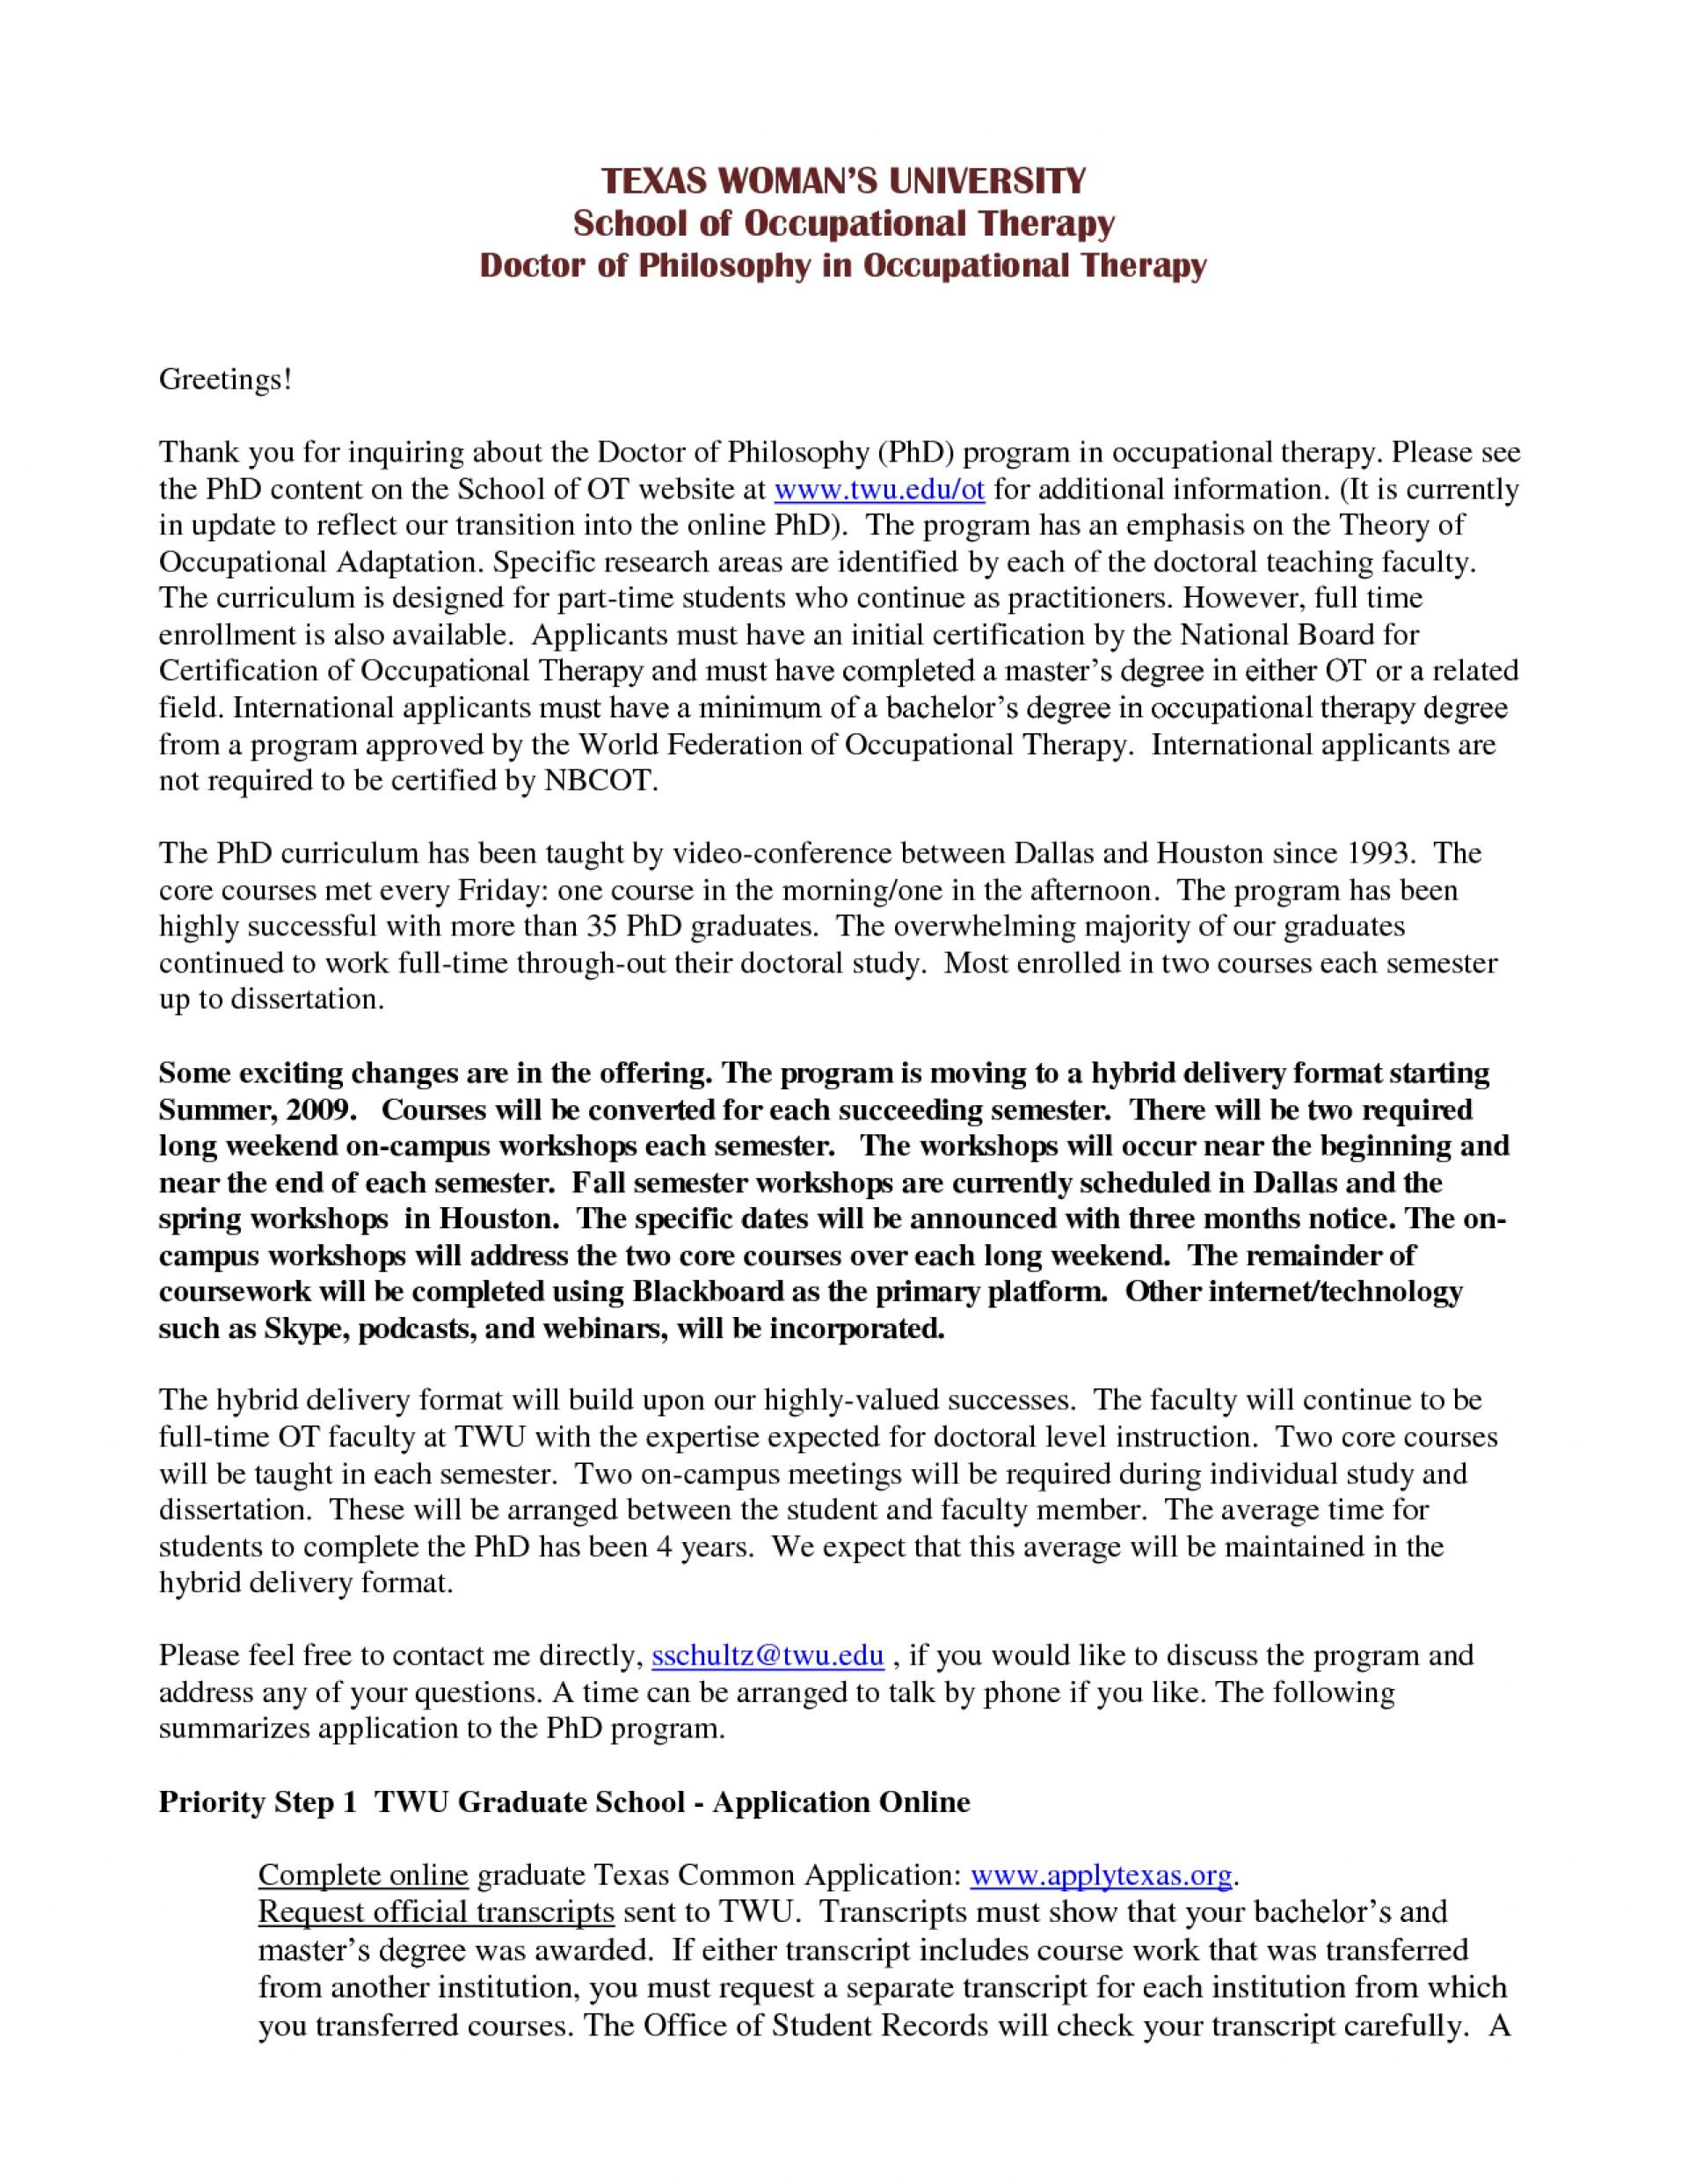 013 Essay Example P2nuwjbgnb Act Incredible Tips Prepscholar 1920